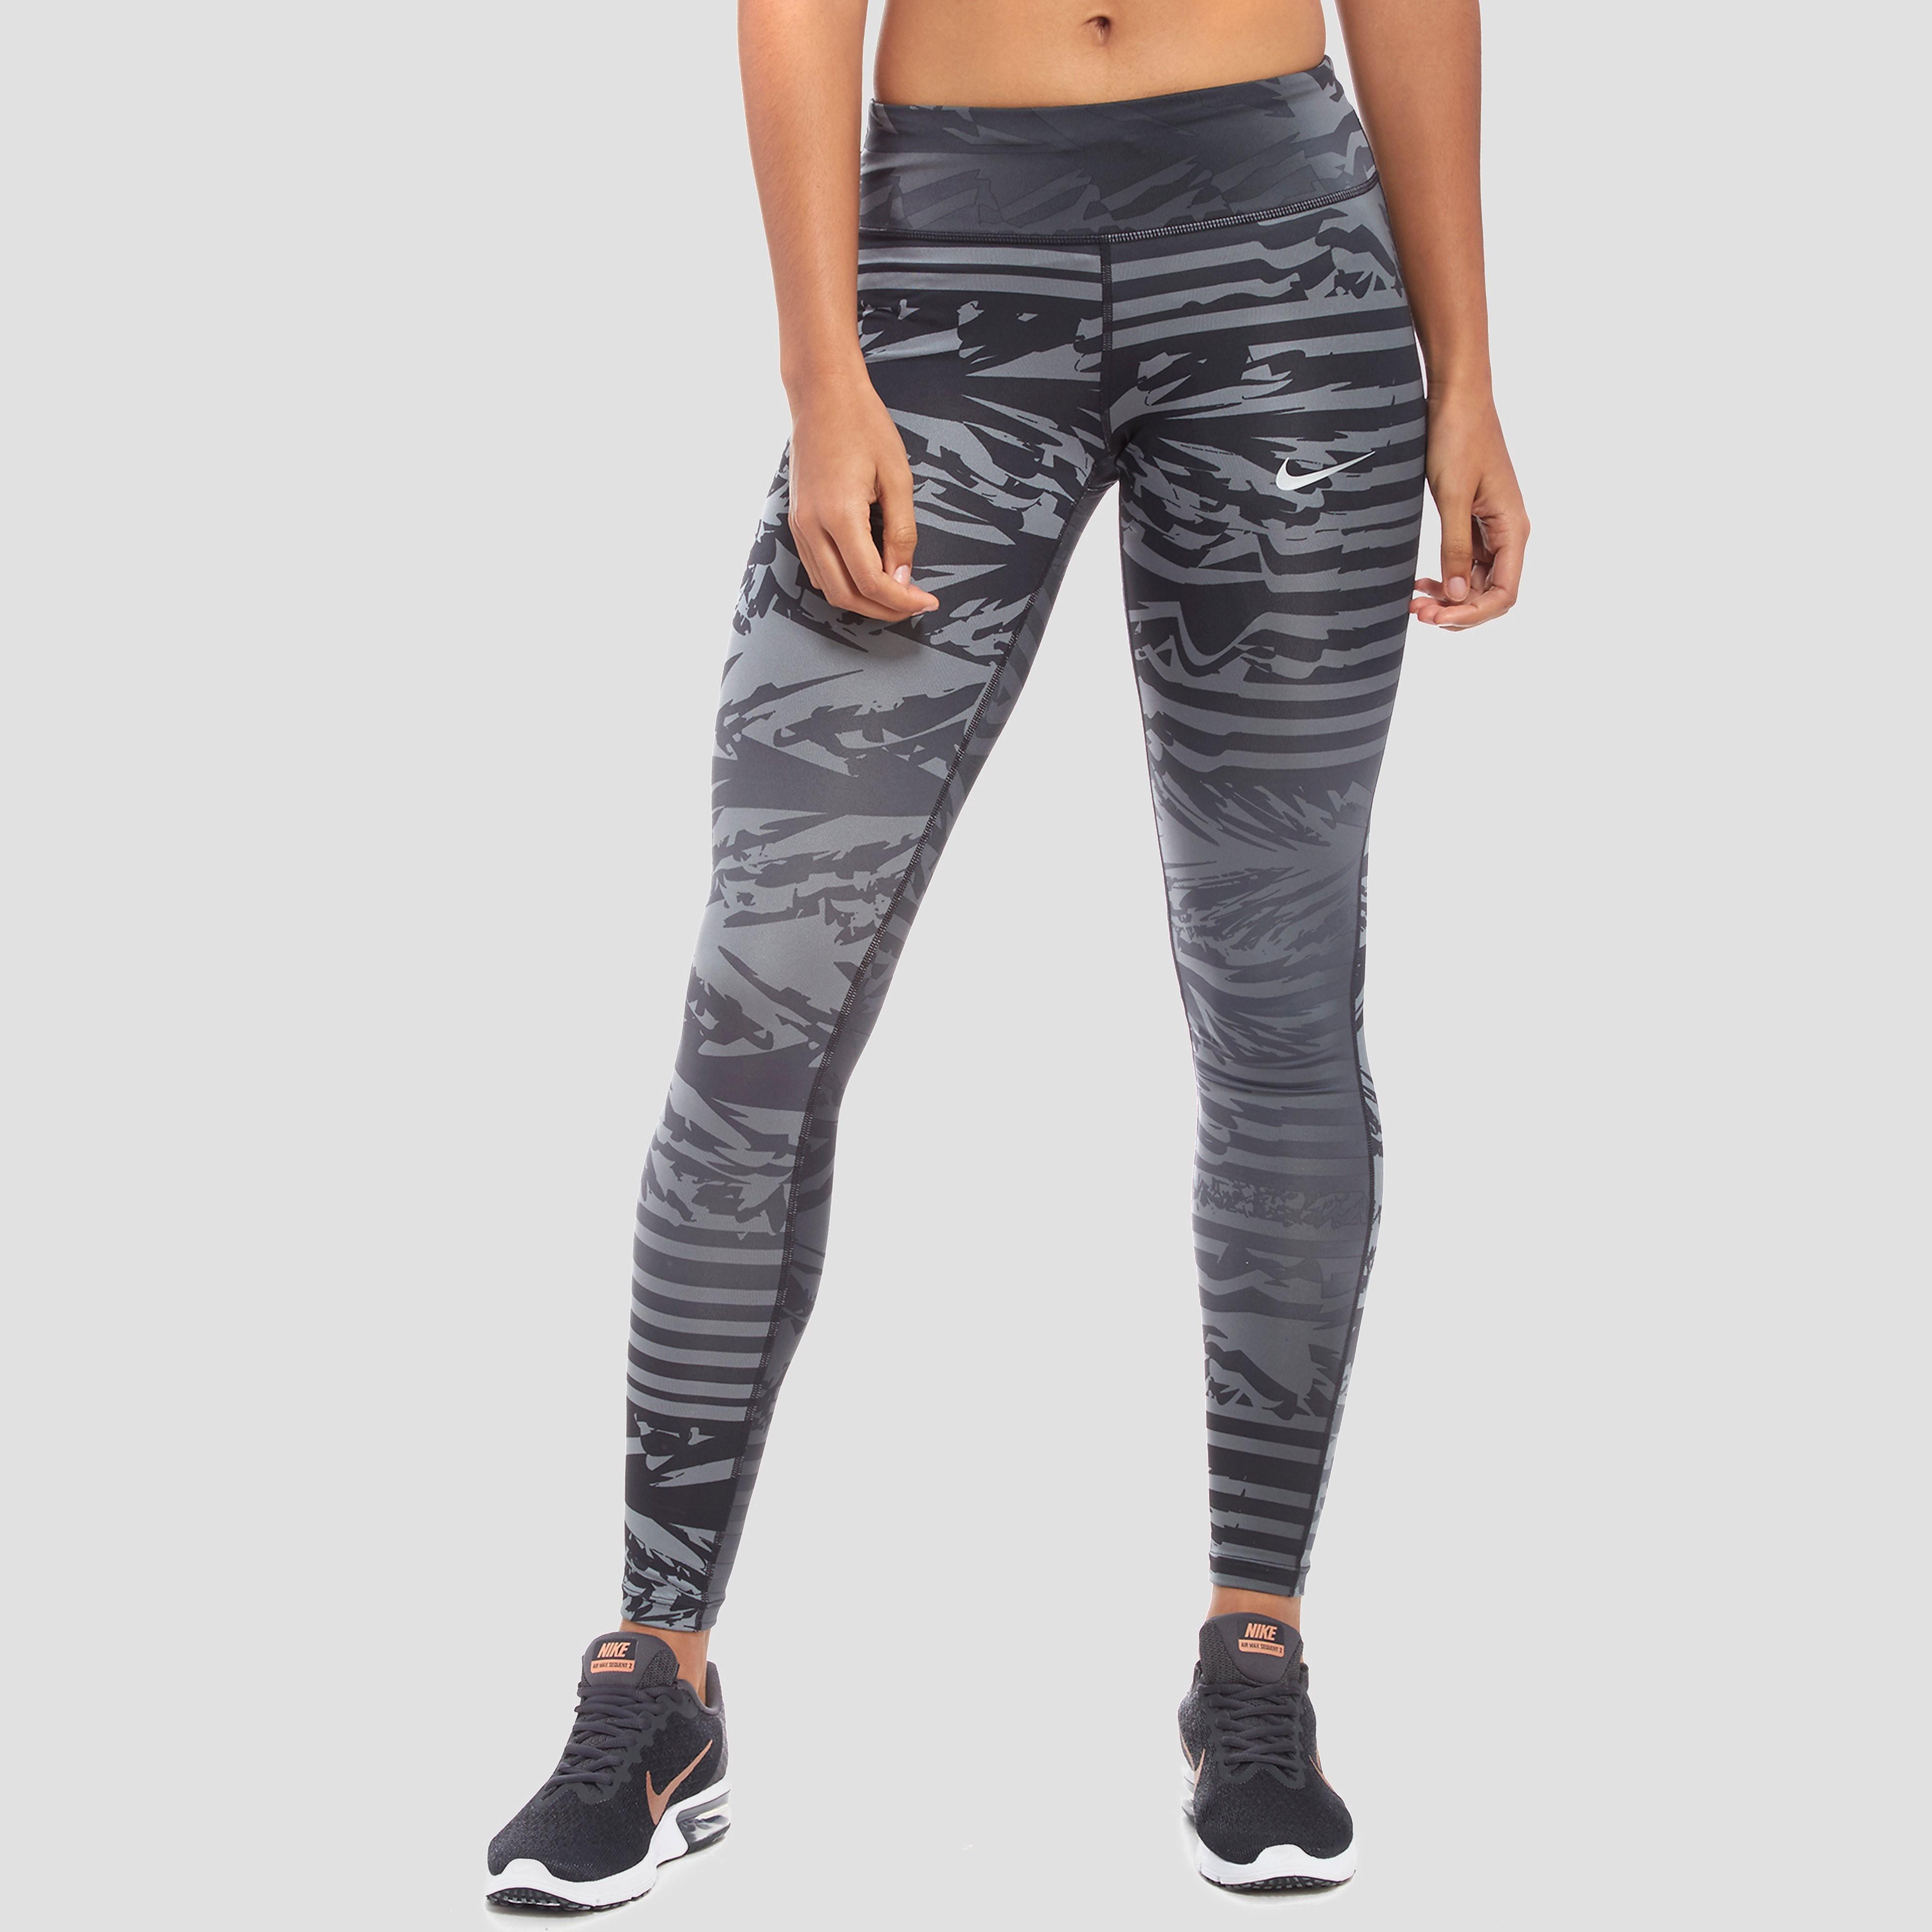 Nike Print Essentials Women's Running Tights